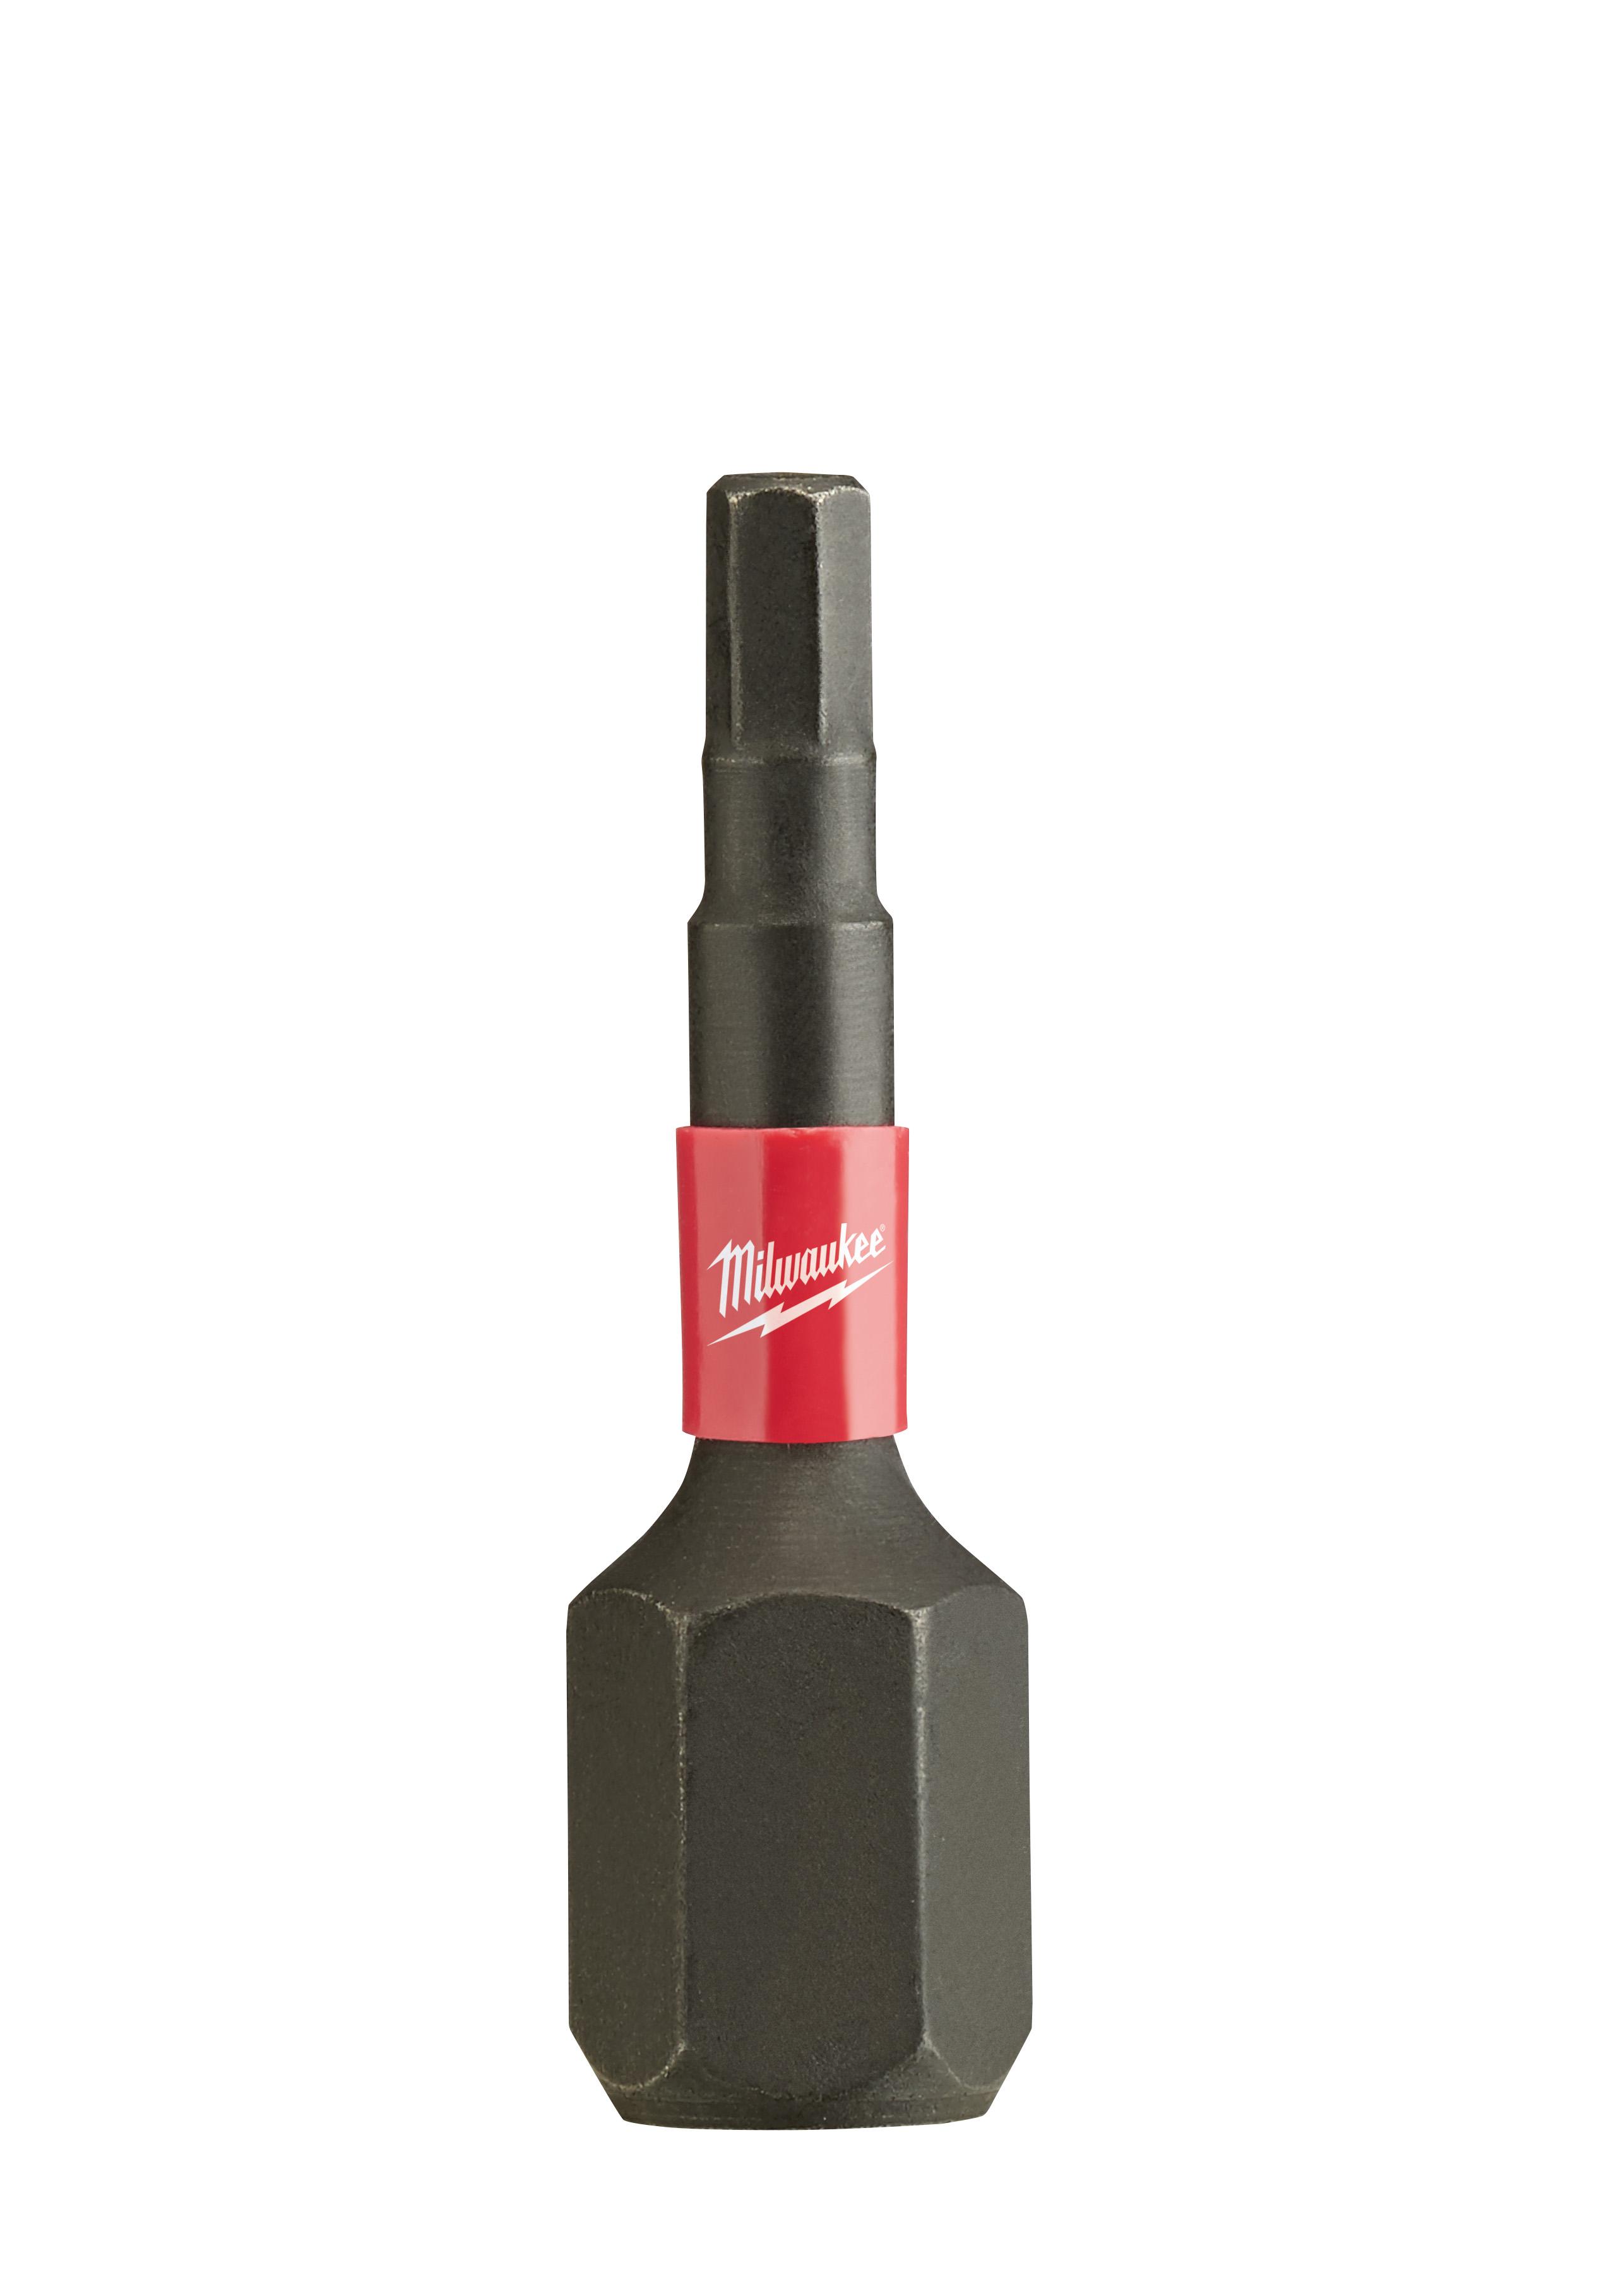 Milwaukee® SHOCKWAVE™ 48-32-4724 Impact Insert Bit, 2.5 mm Hex Point, 1 in OAL, Custom Alloy76™ Steel